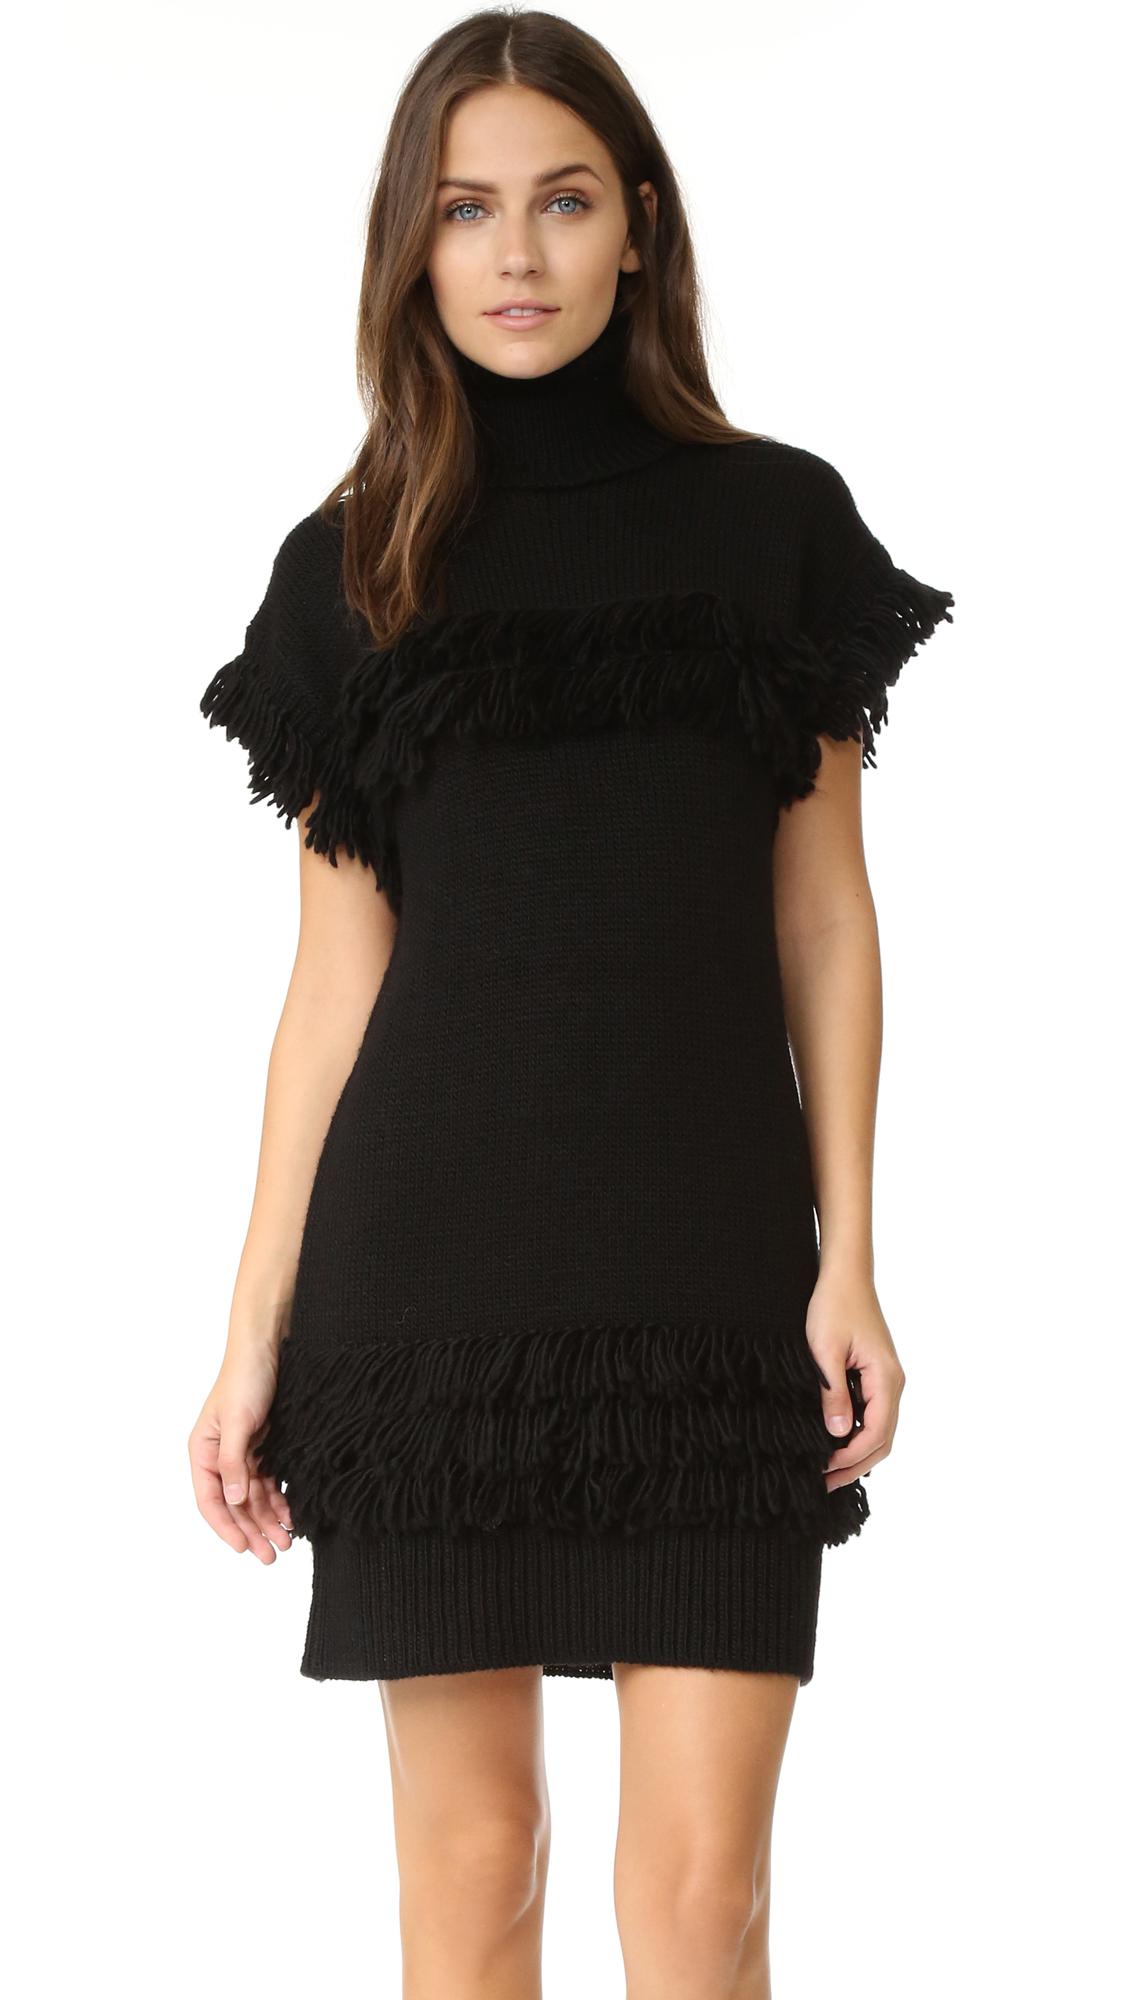 rachel zoe female rachel zoe teegan sweater dress black